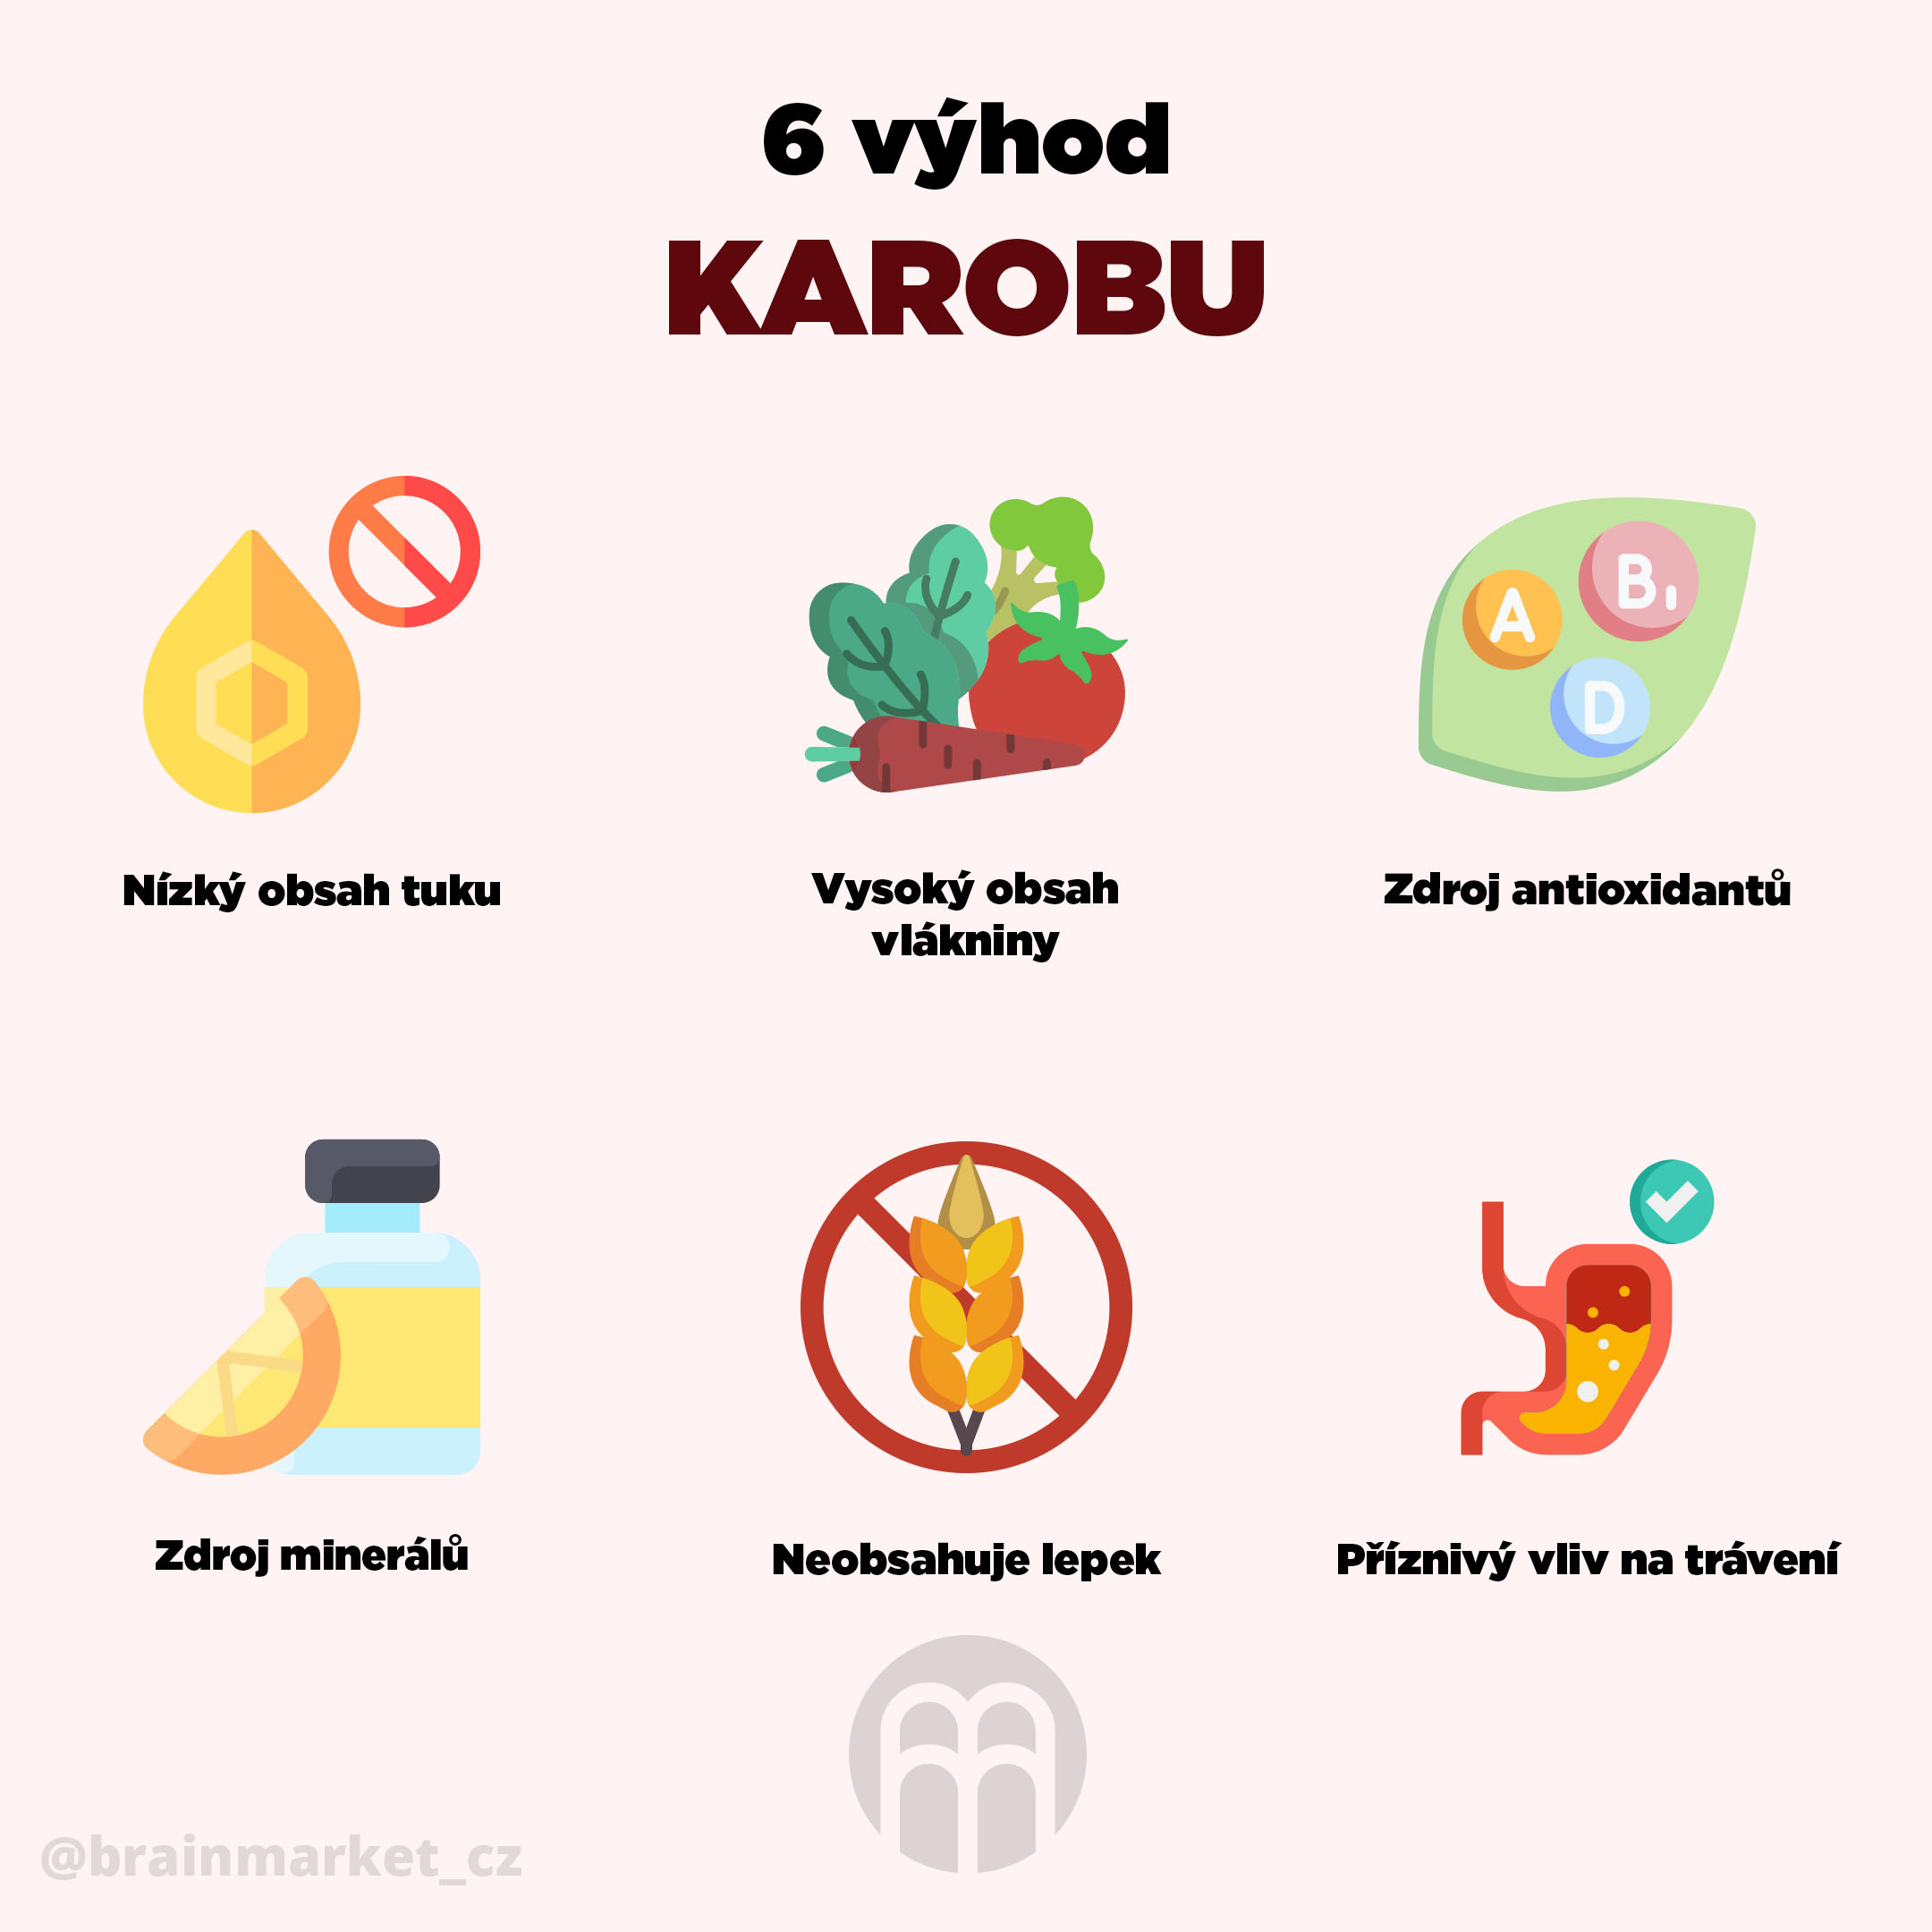 vyhody-karobu-brainmarket-infografika-cz